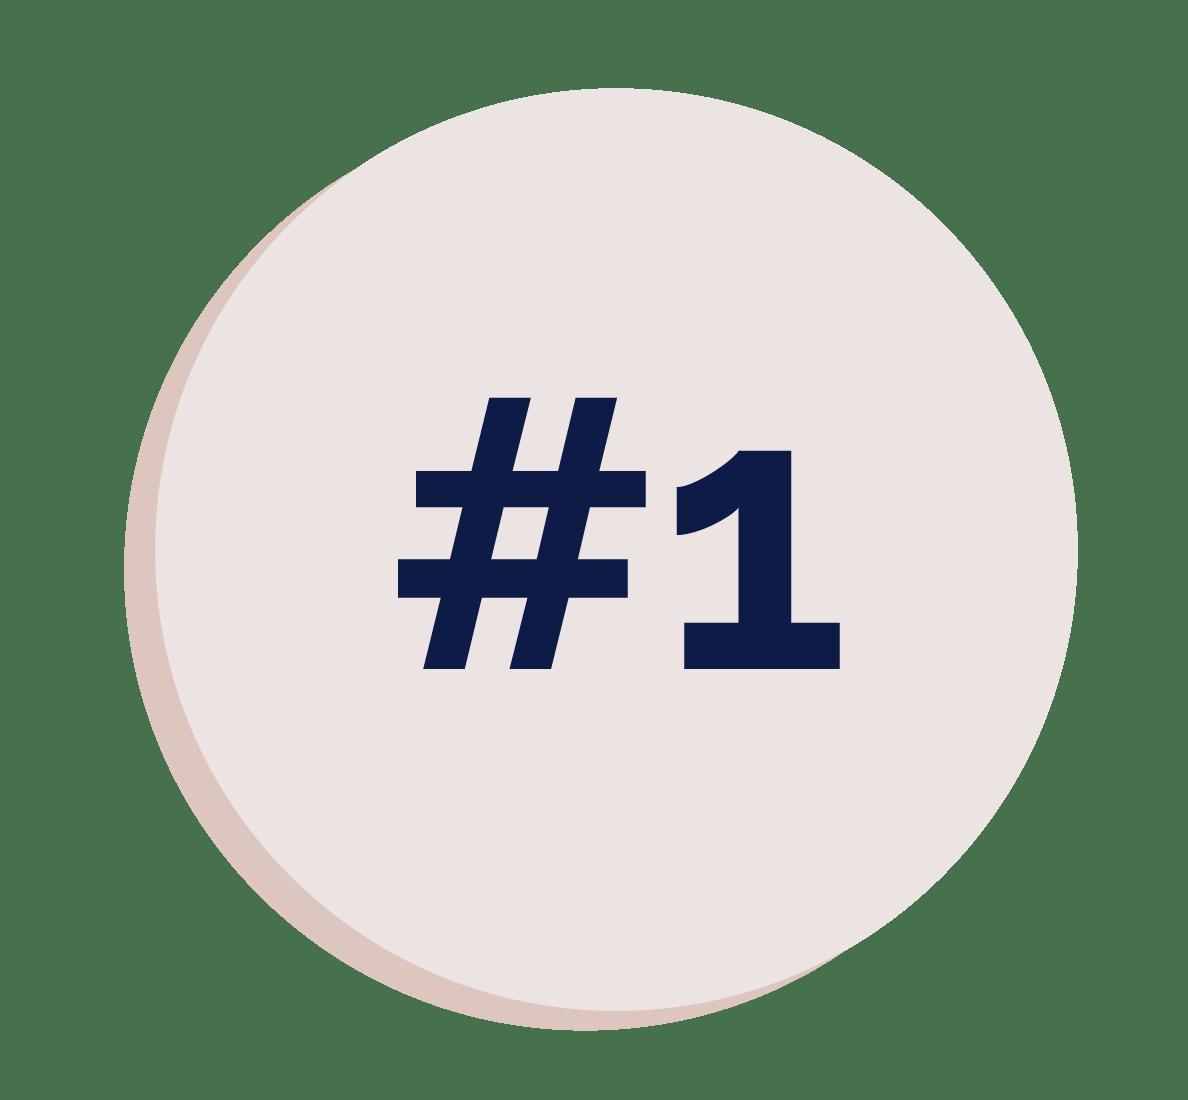 numbered item